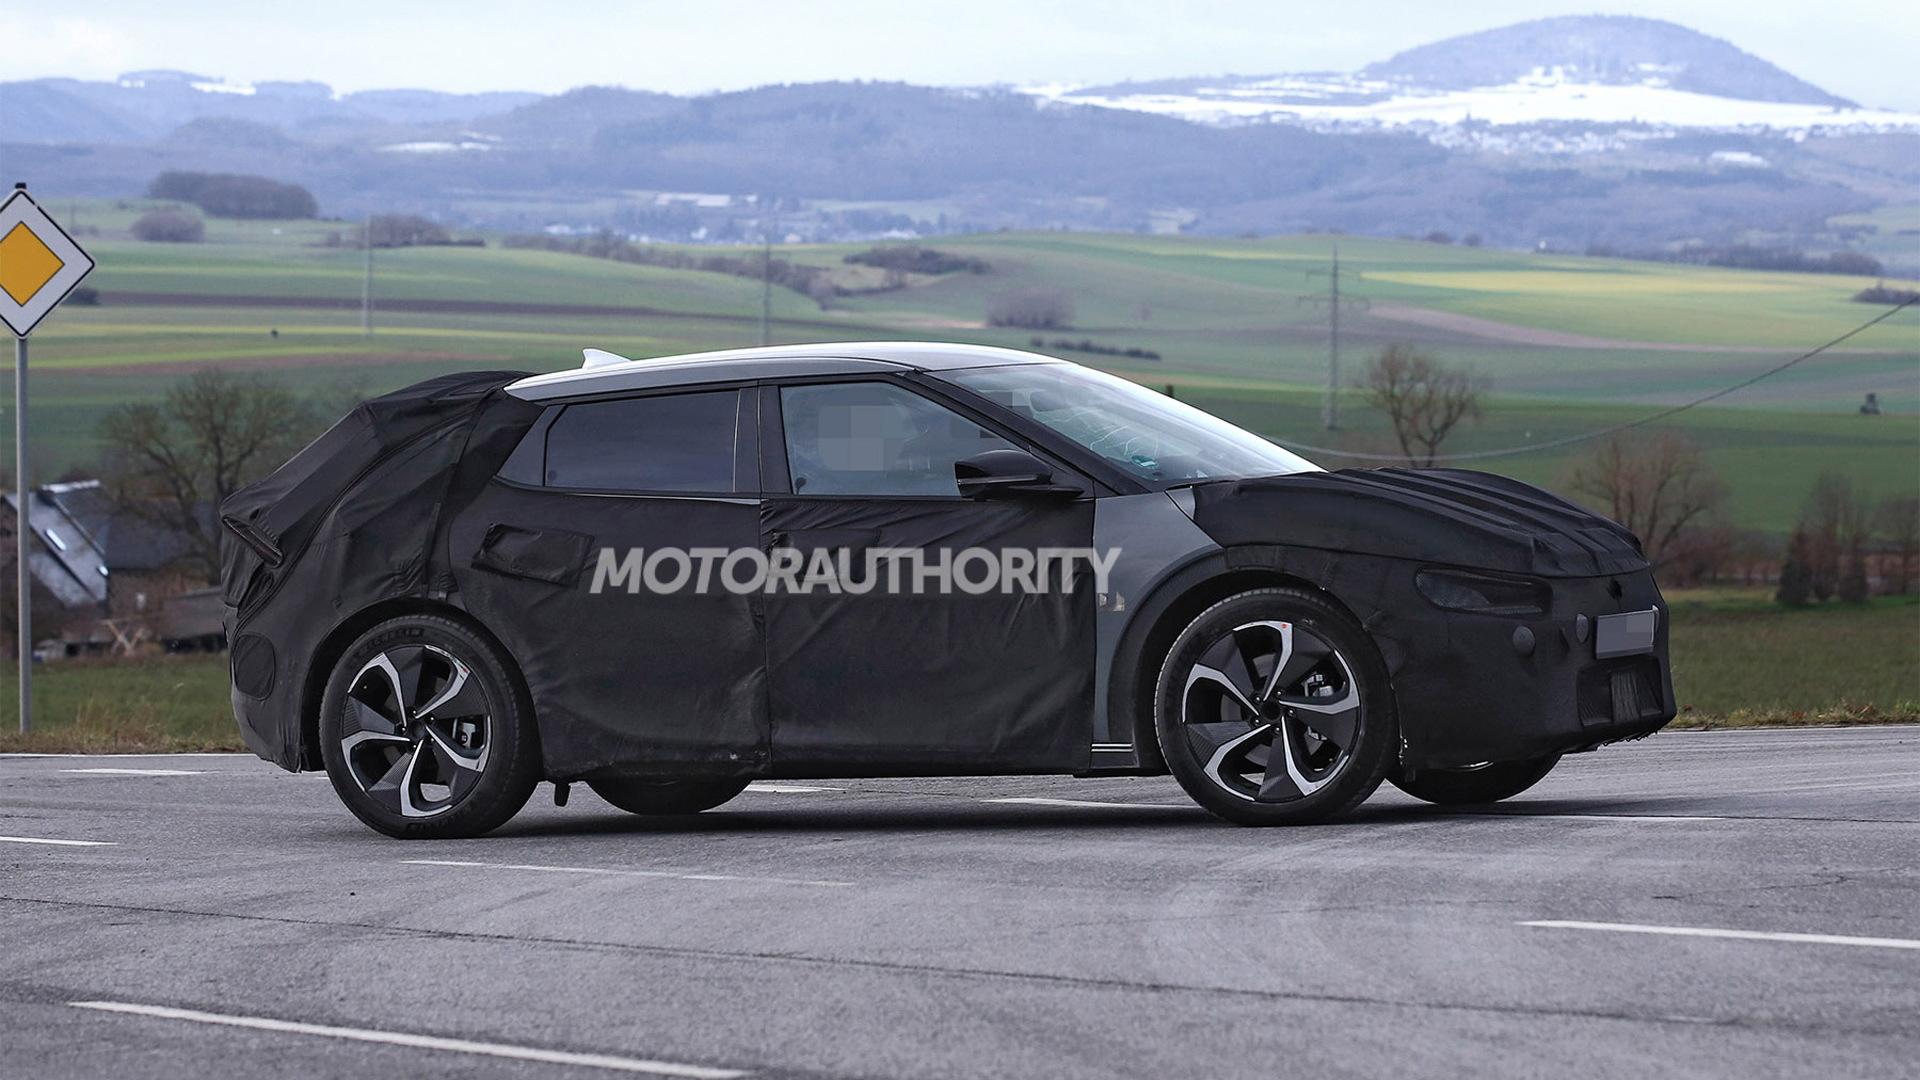 2022 Kia CV electric vehicle spy shots - Photo credit:S. Baldauf/SB-Medien